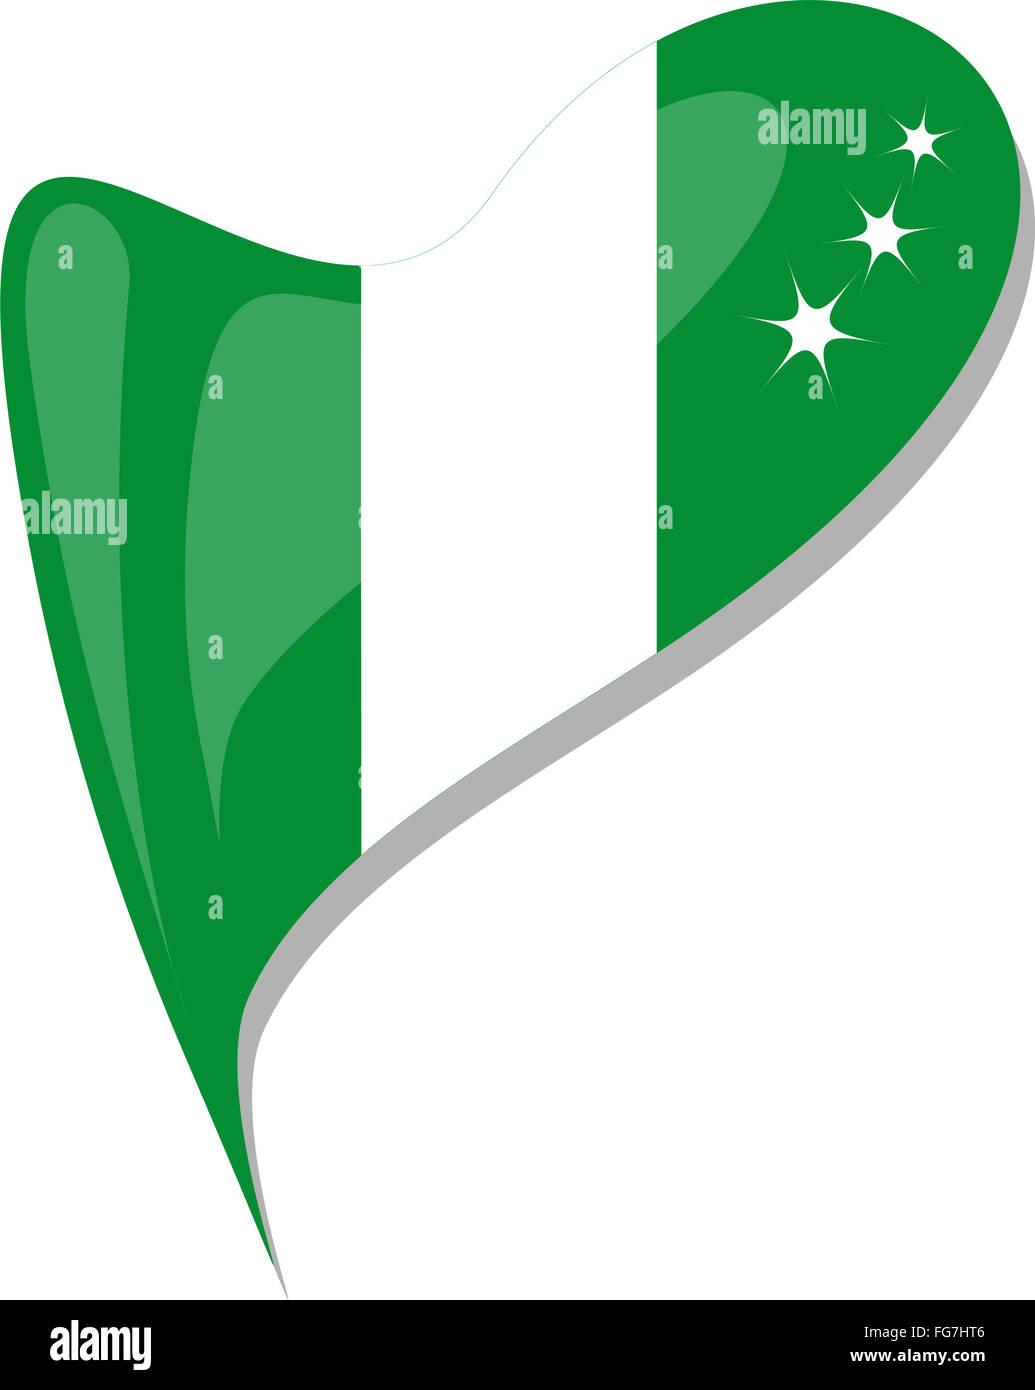 Vector nigeria flag heart glossy stock photos vector nigeria flag nigeria in heart icon of nigeria national flag vector stock image ccuart Choice Image